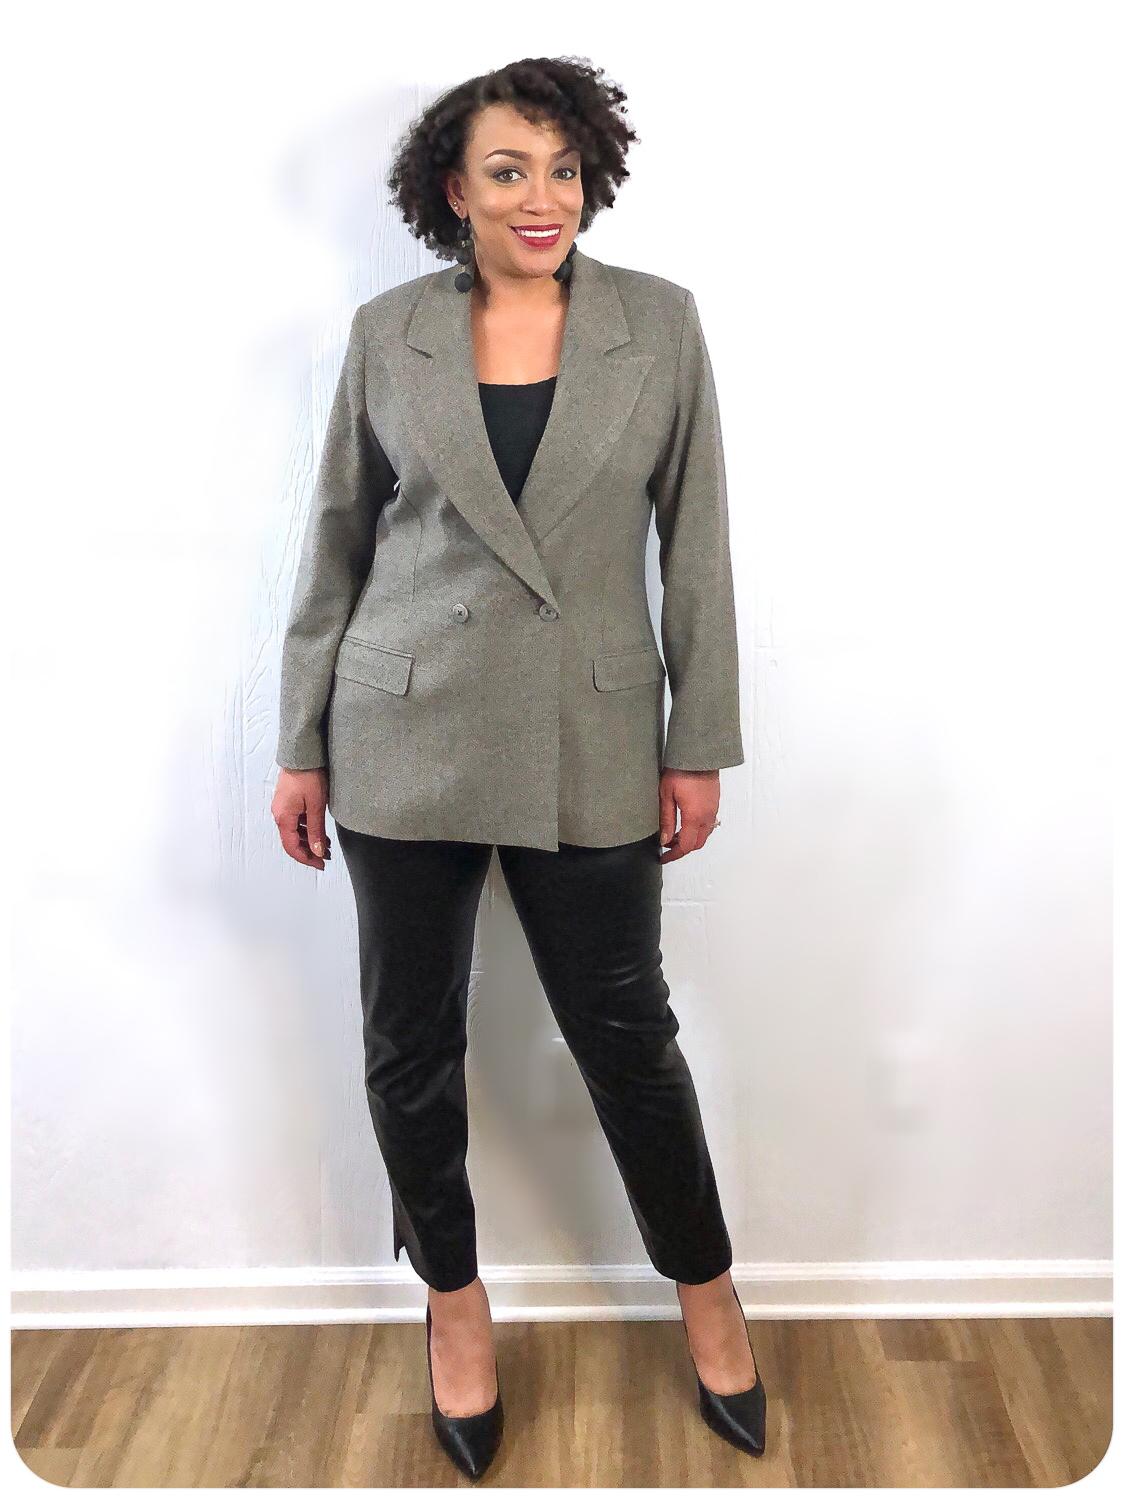 4 Ways To Be More Stylish & Fashionable - Blazer - Erica Bunker DIY Style